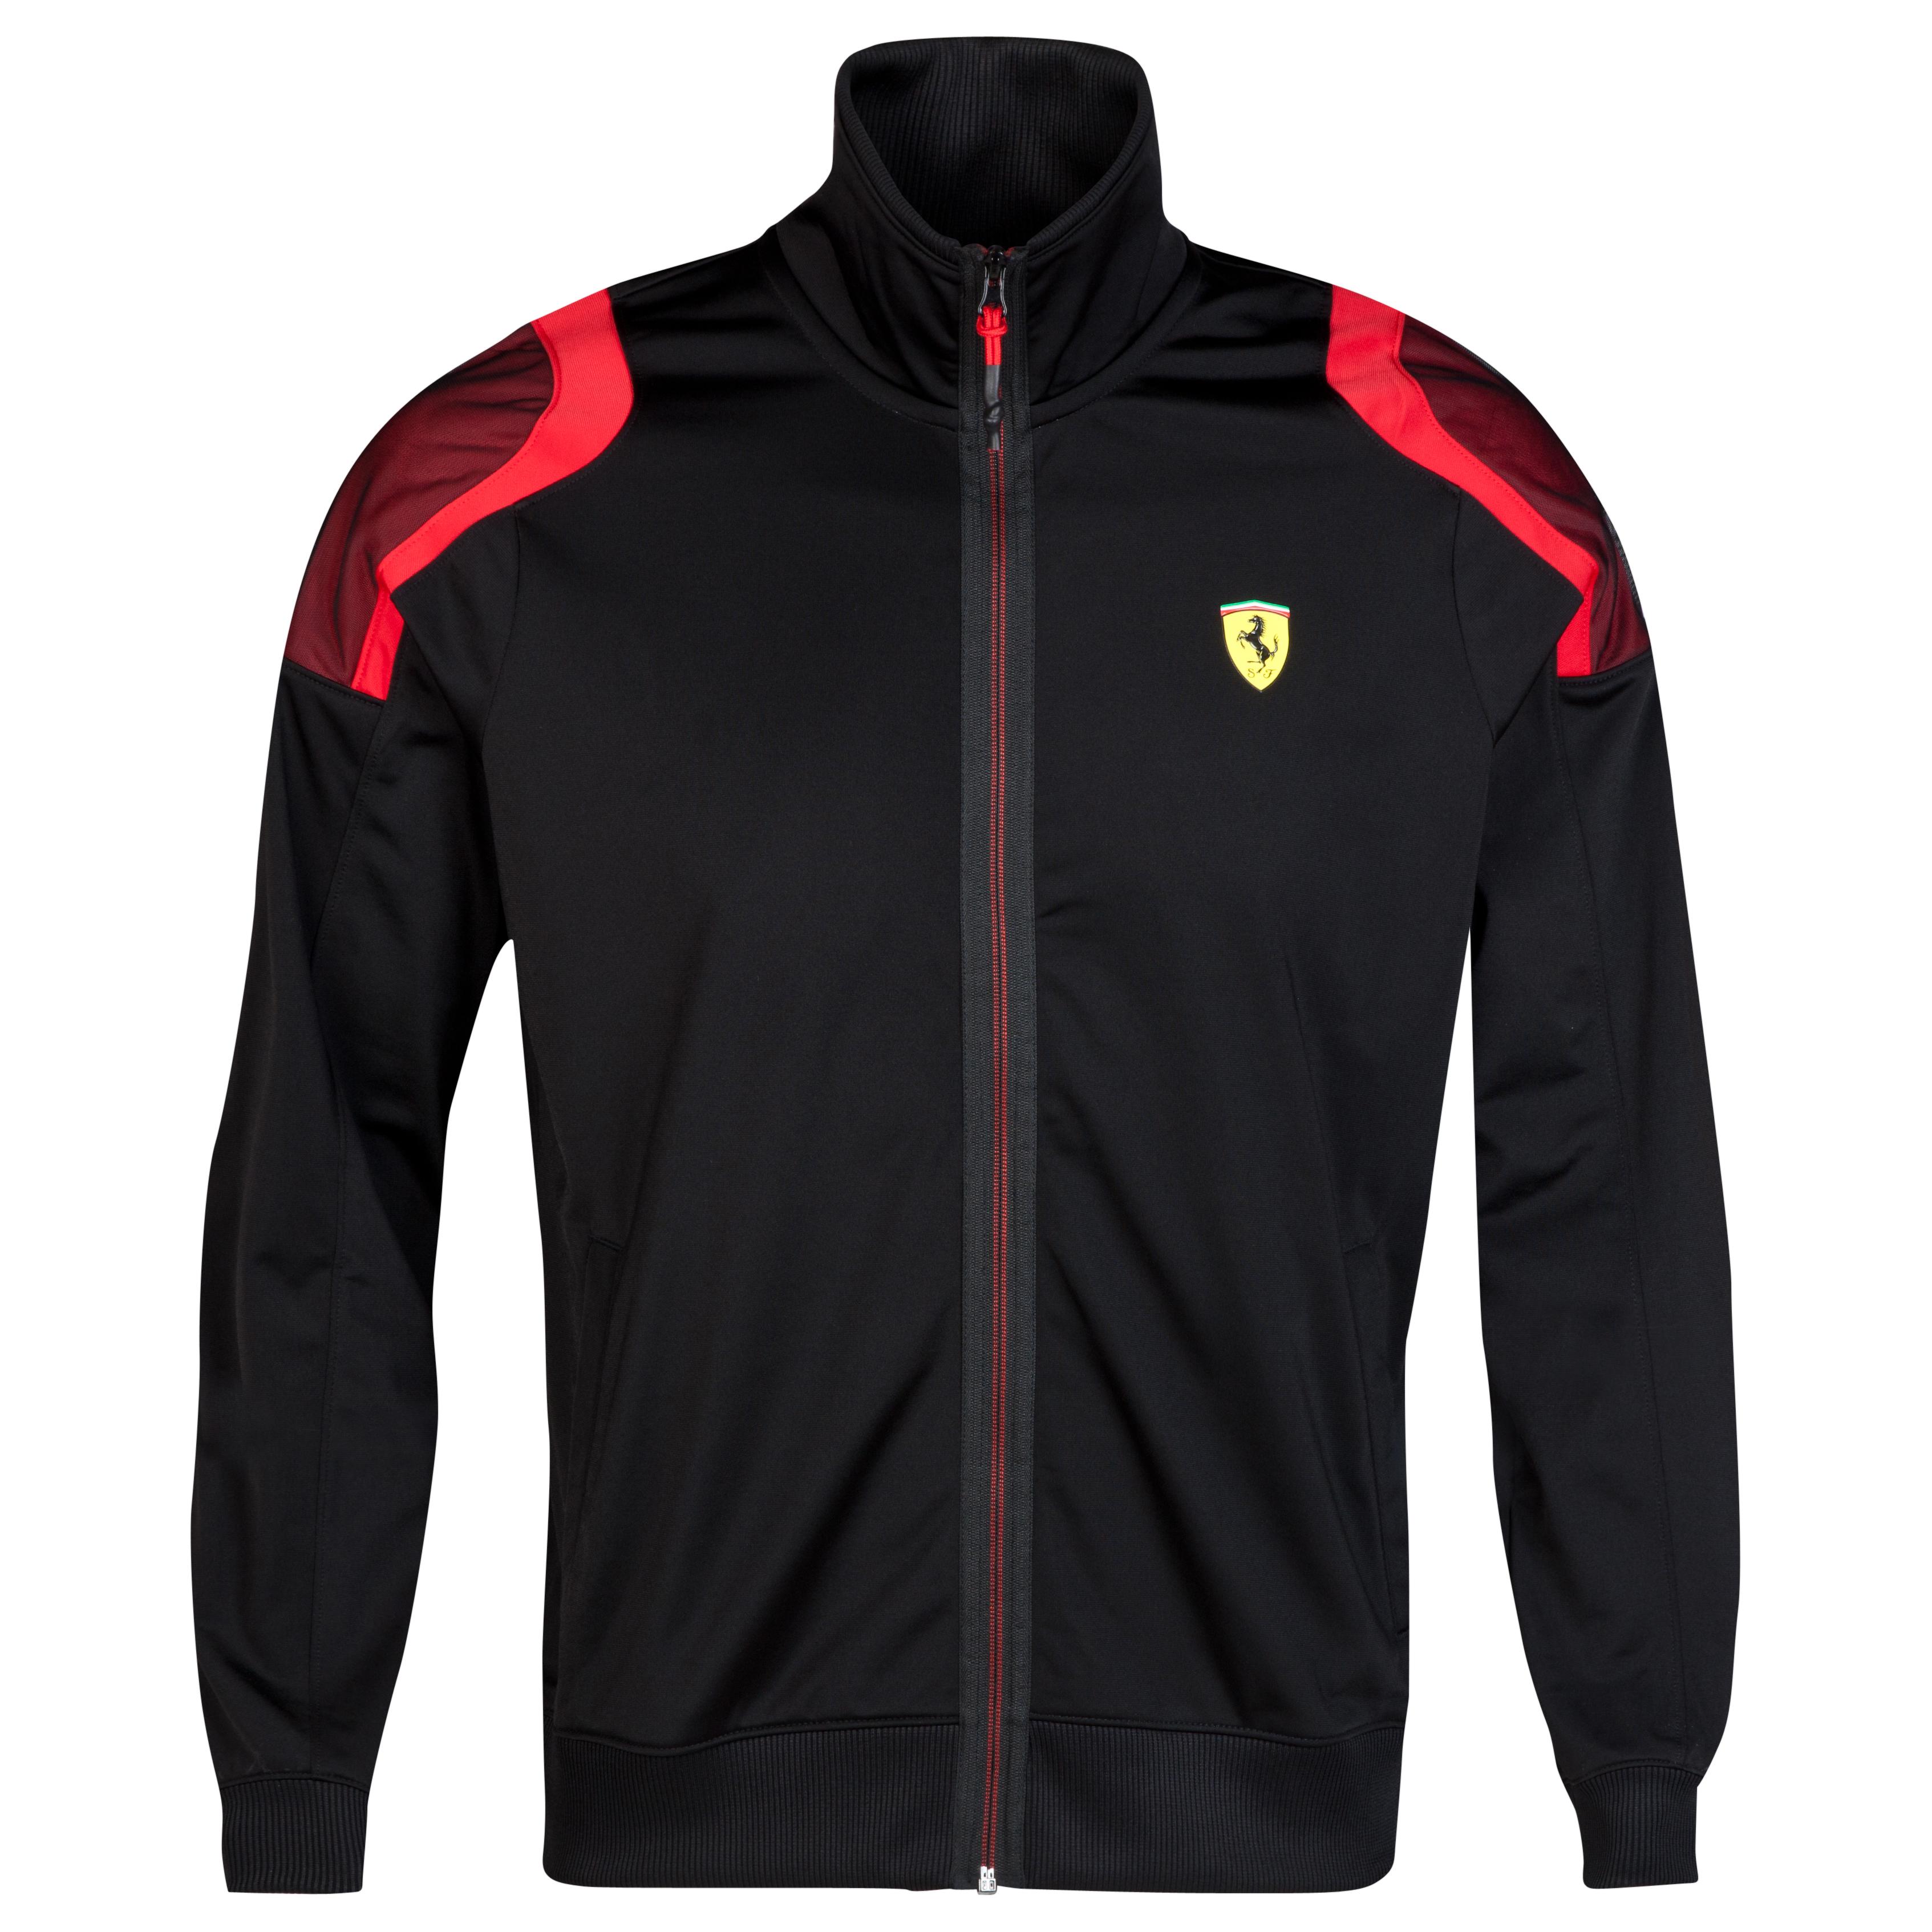 Scuderia Ferrari Track Jacket Black